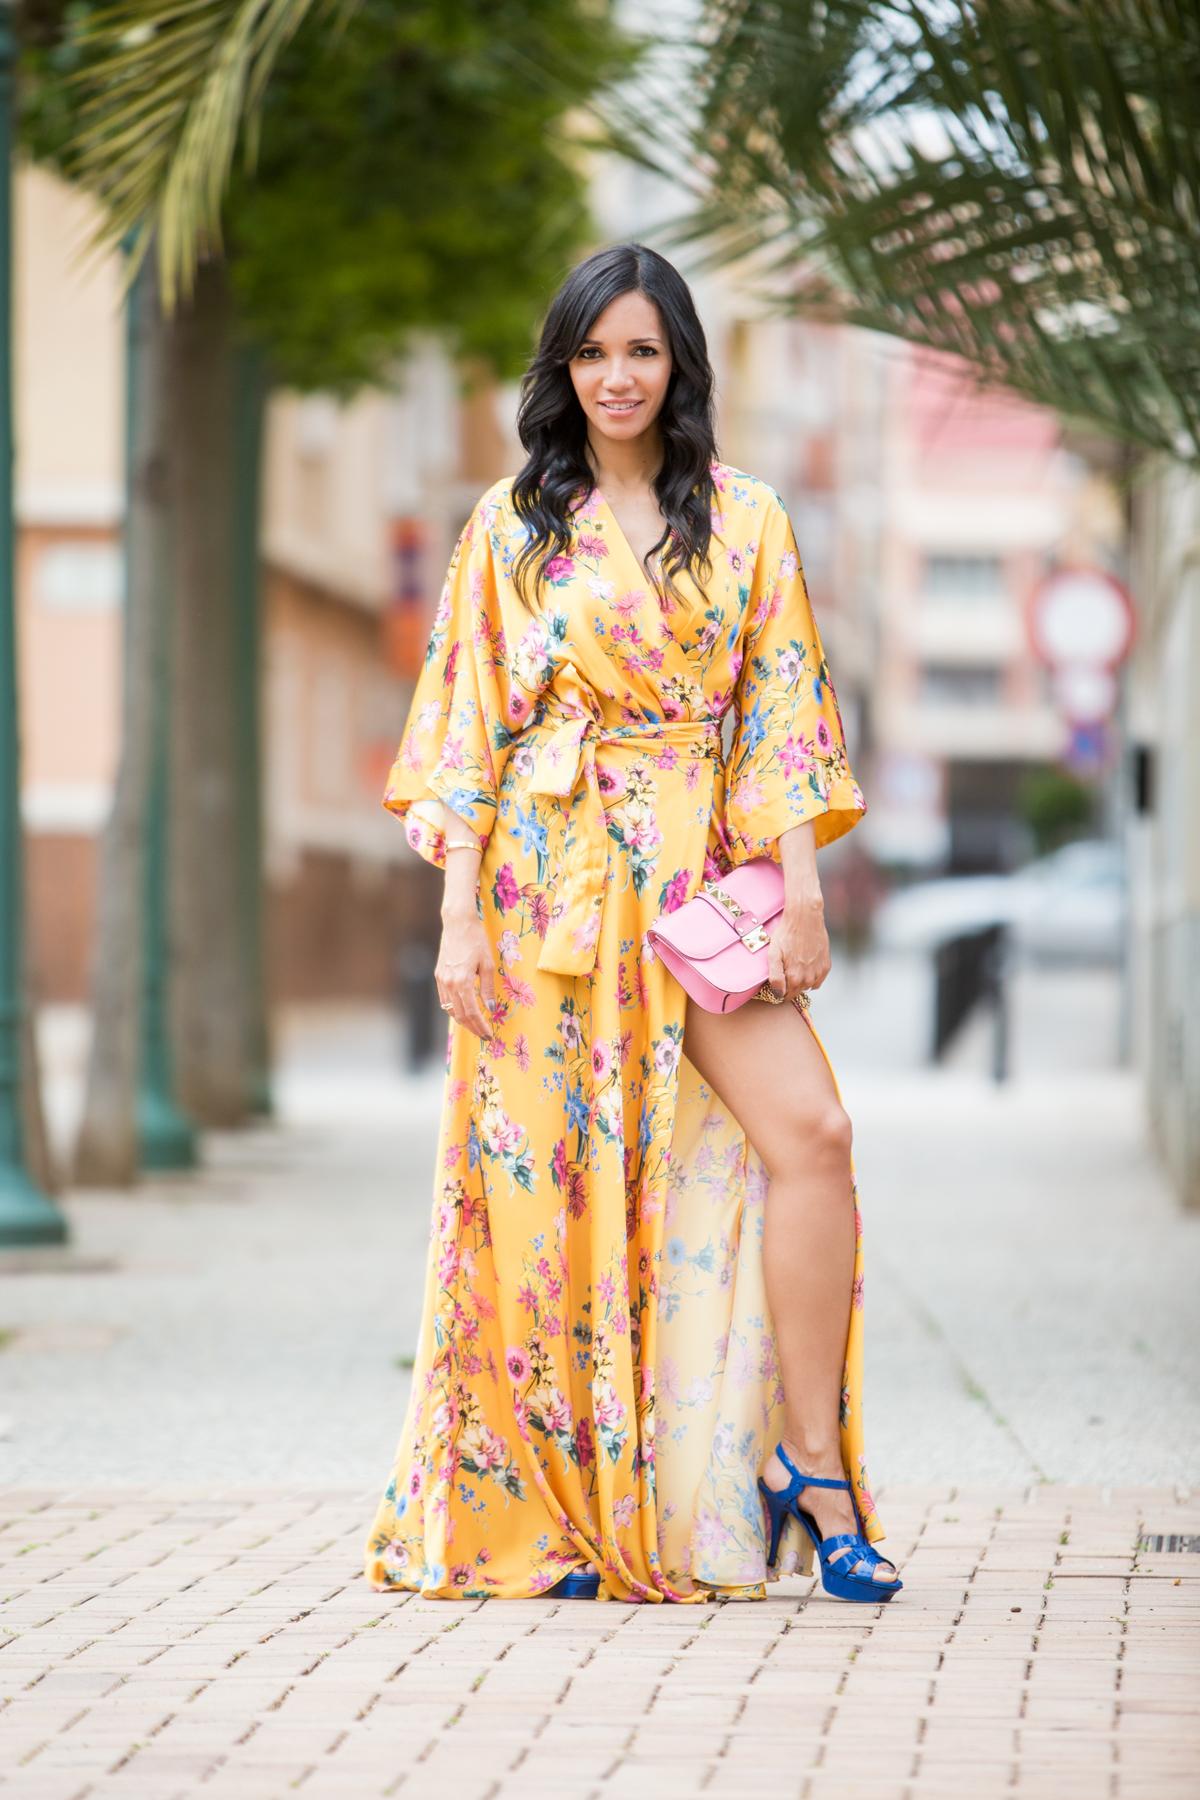 Carolina Personal Shopper BBC Etxart & Panno